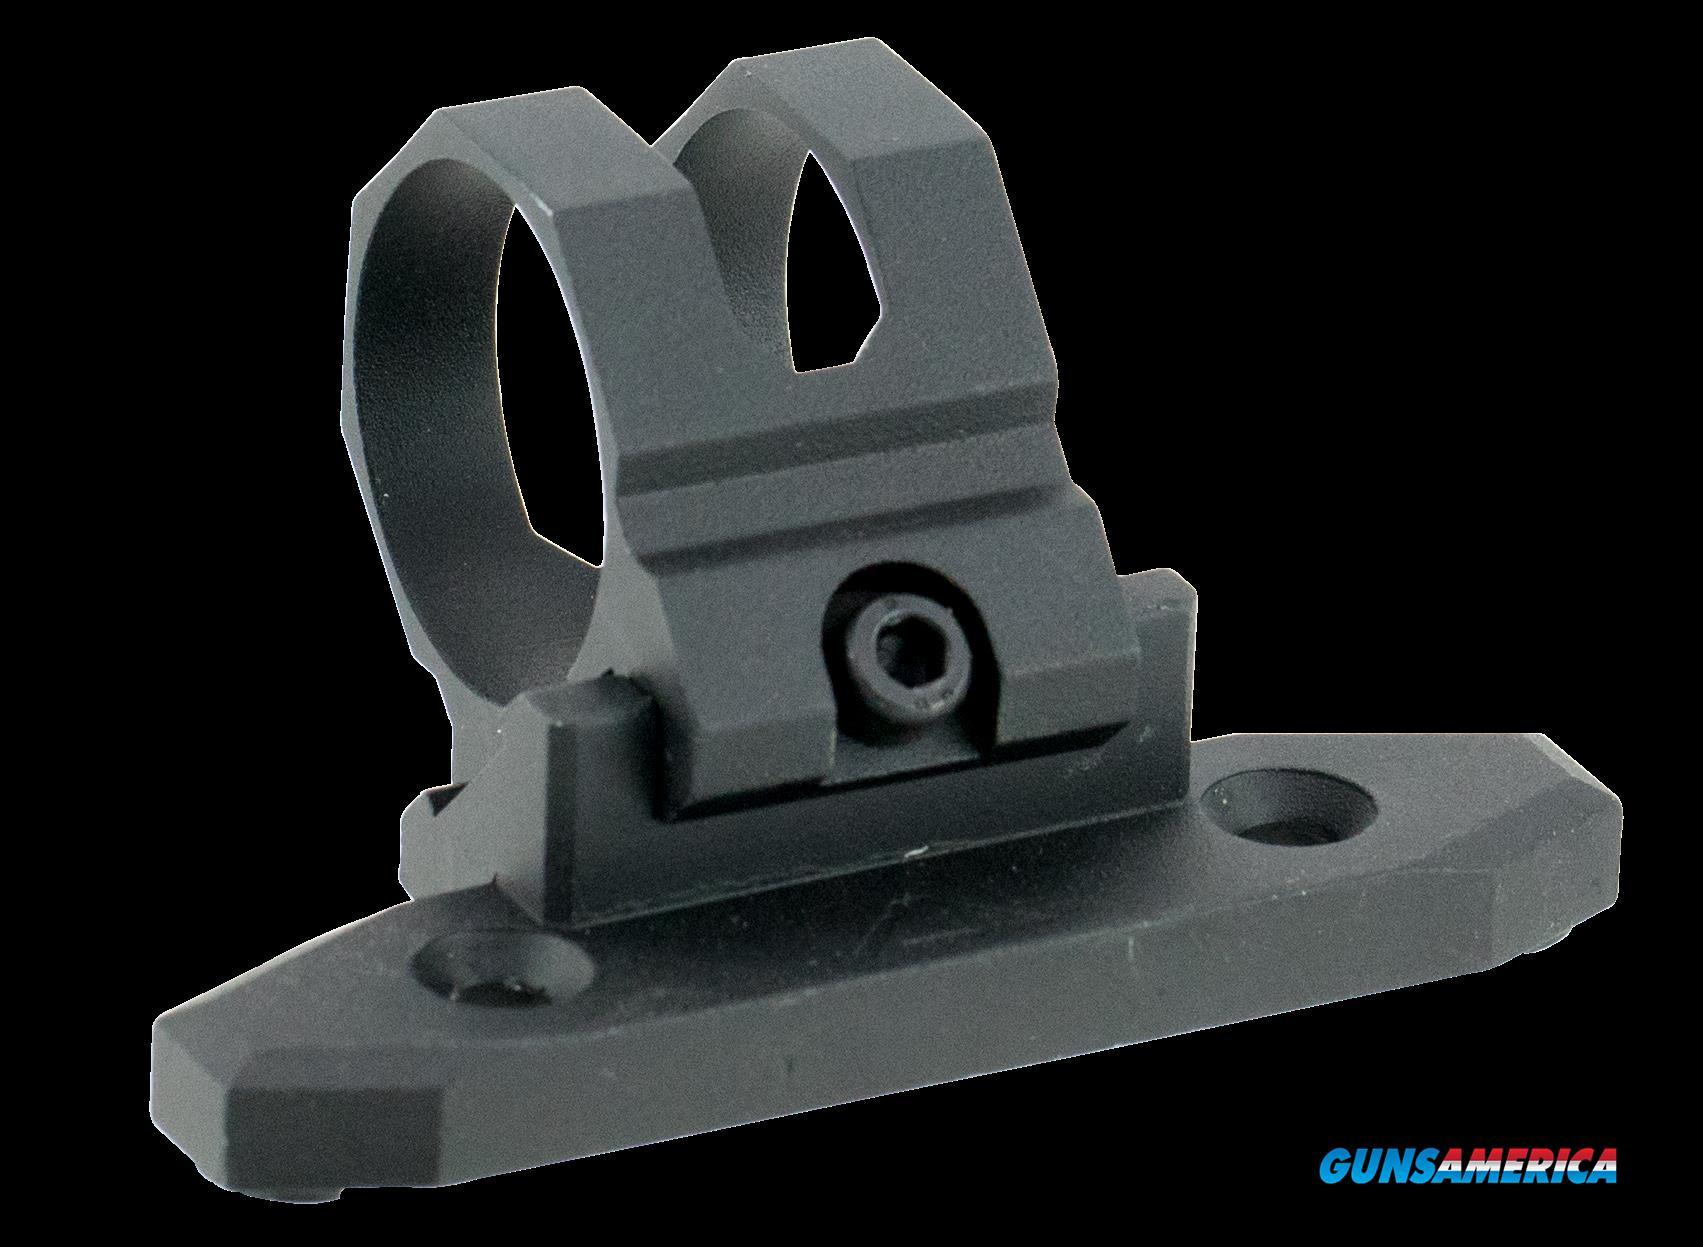 Aim Sports 45 Degree Offset Mount, Aimsports Akmc03    1in 45 Keymod Mnt  Guns > Pistols > 1911 Pistol Copies (non-Colt)